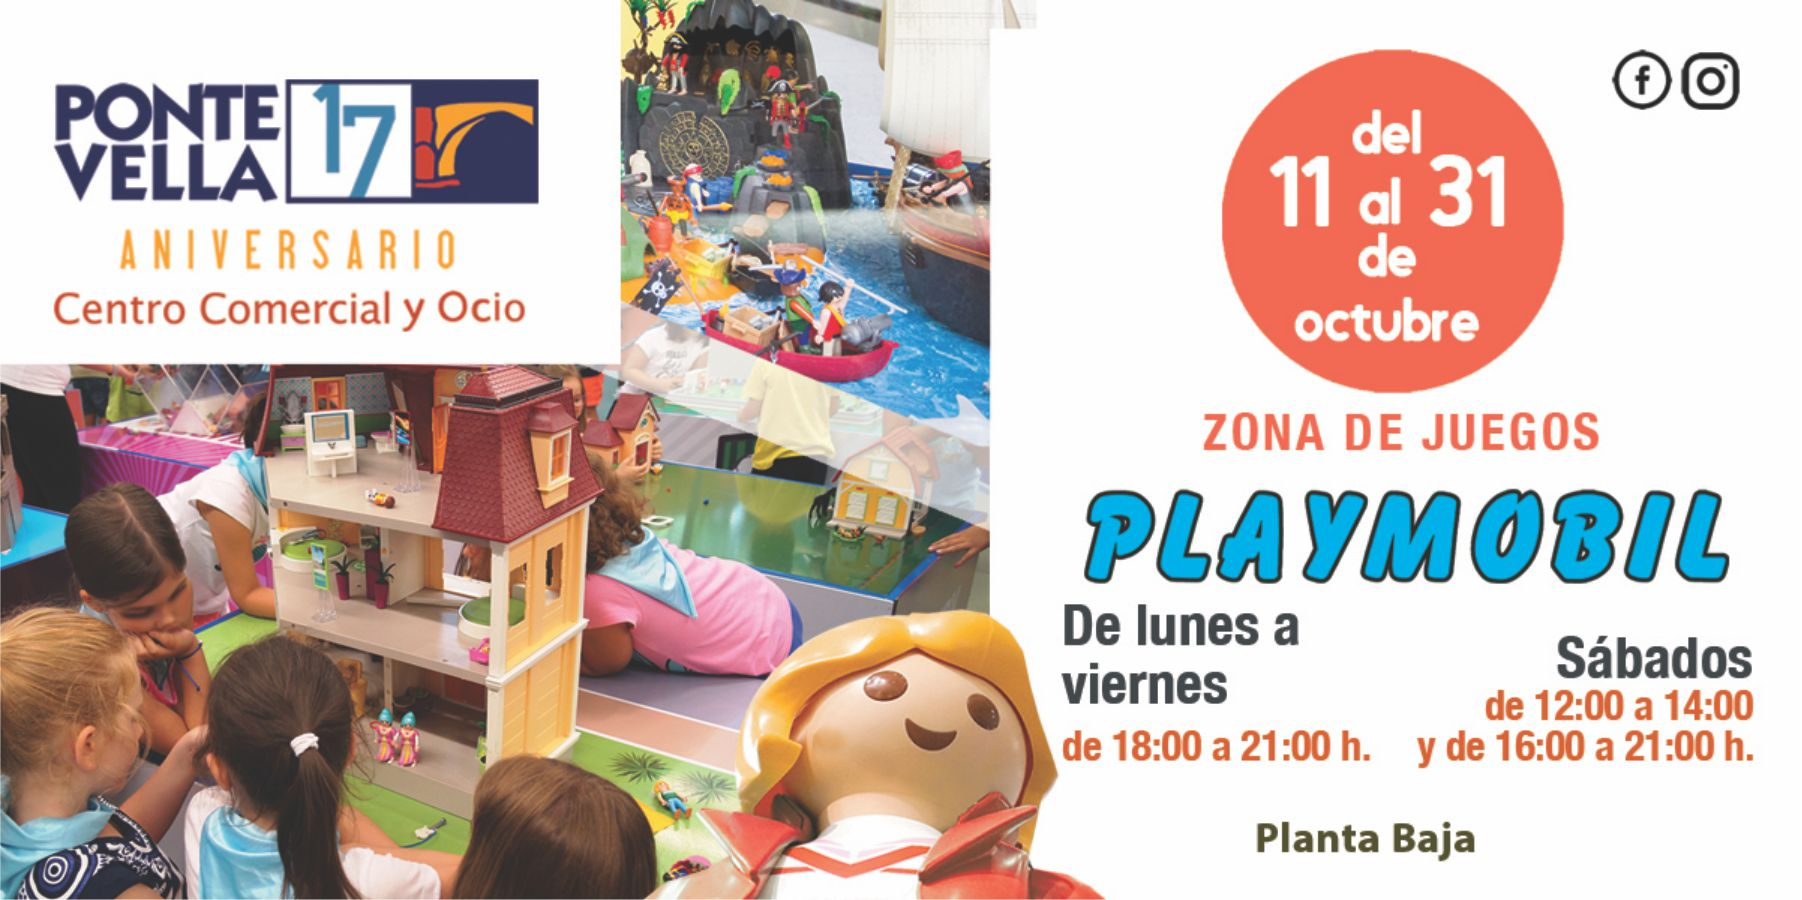 Zona Juego Playmobil